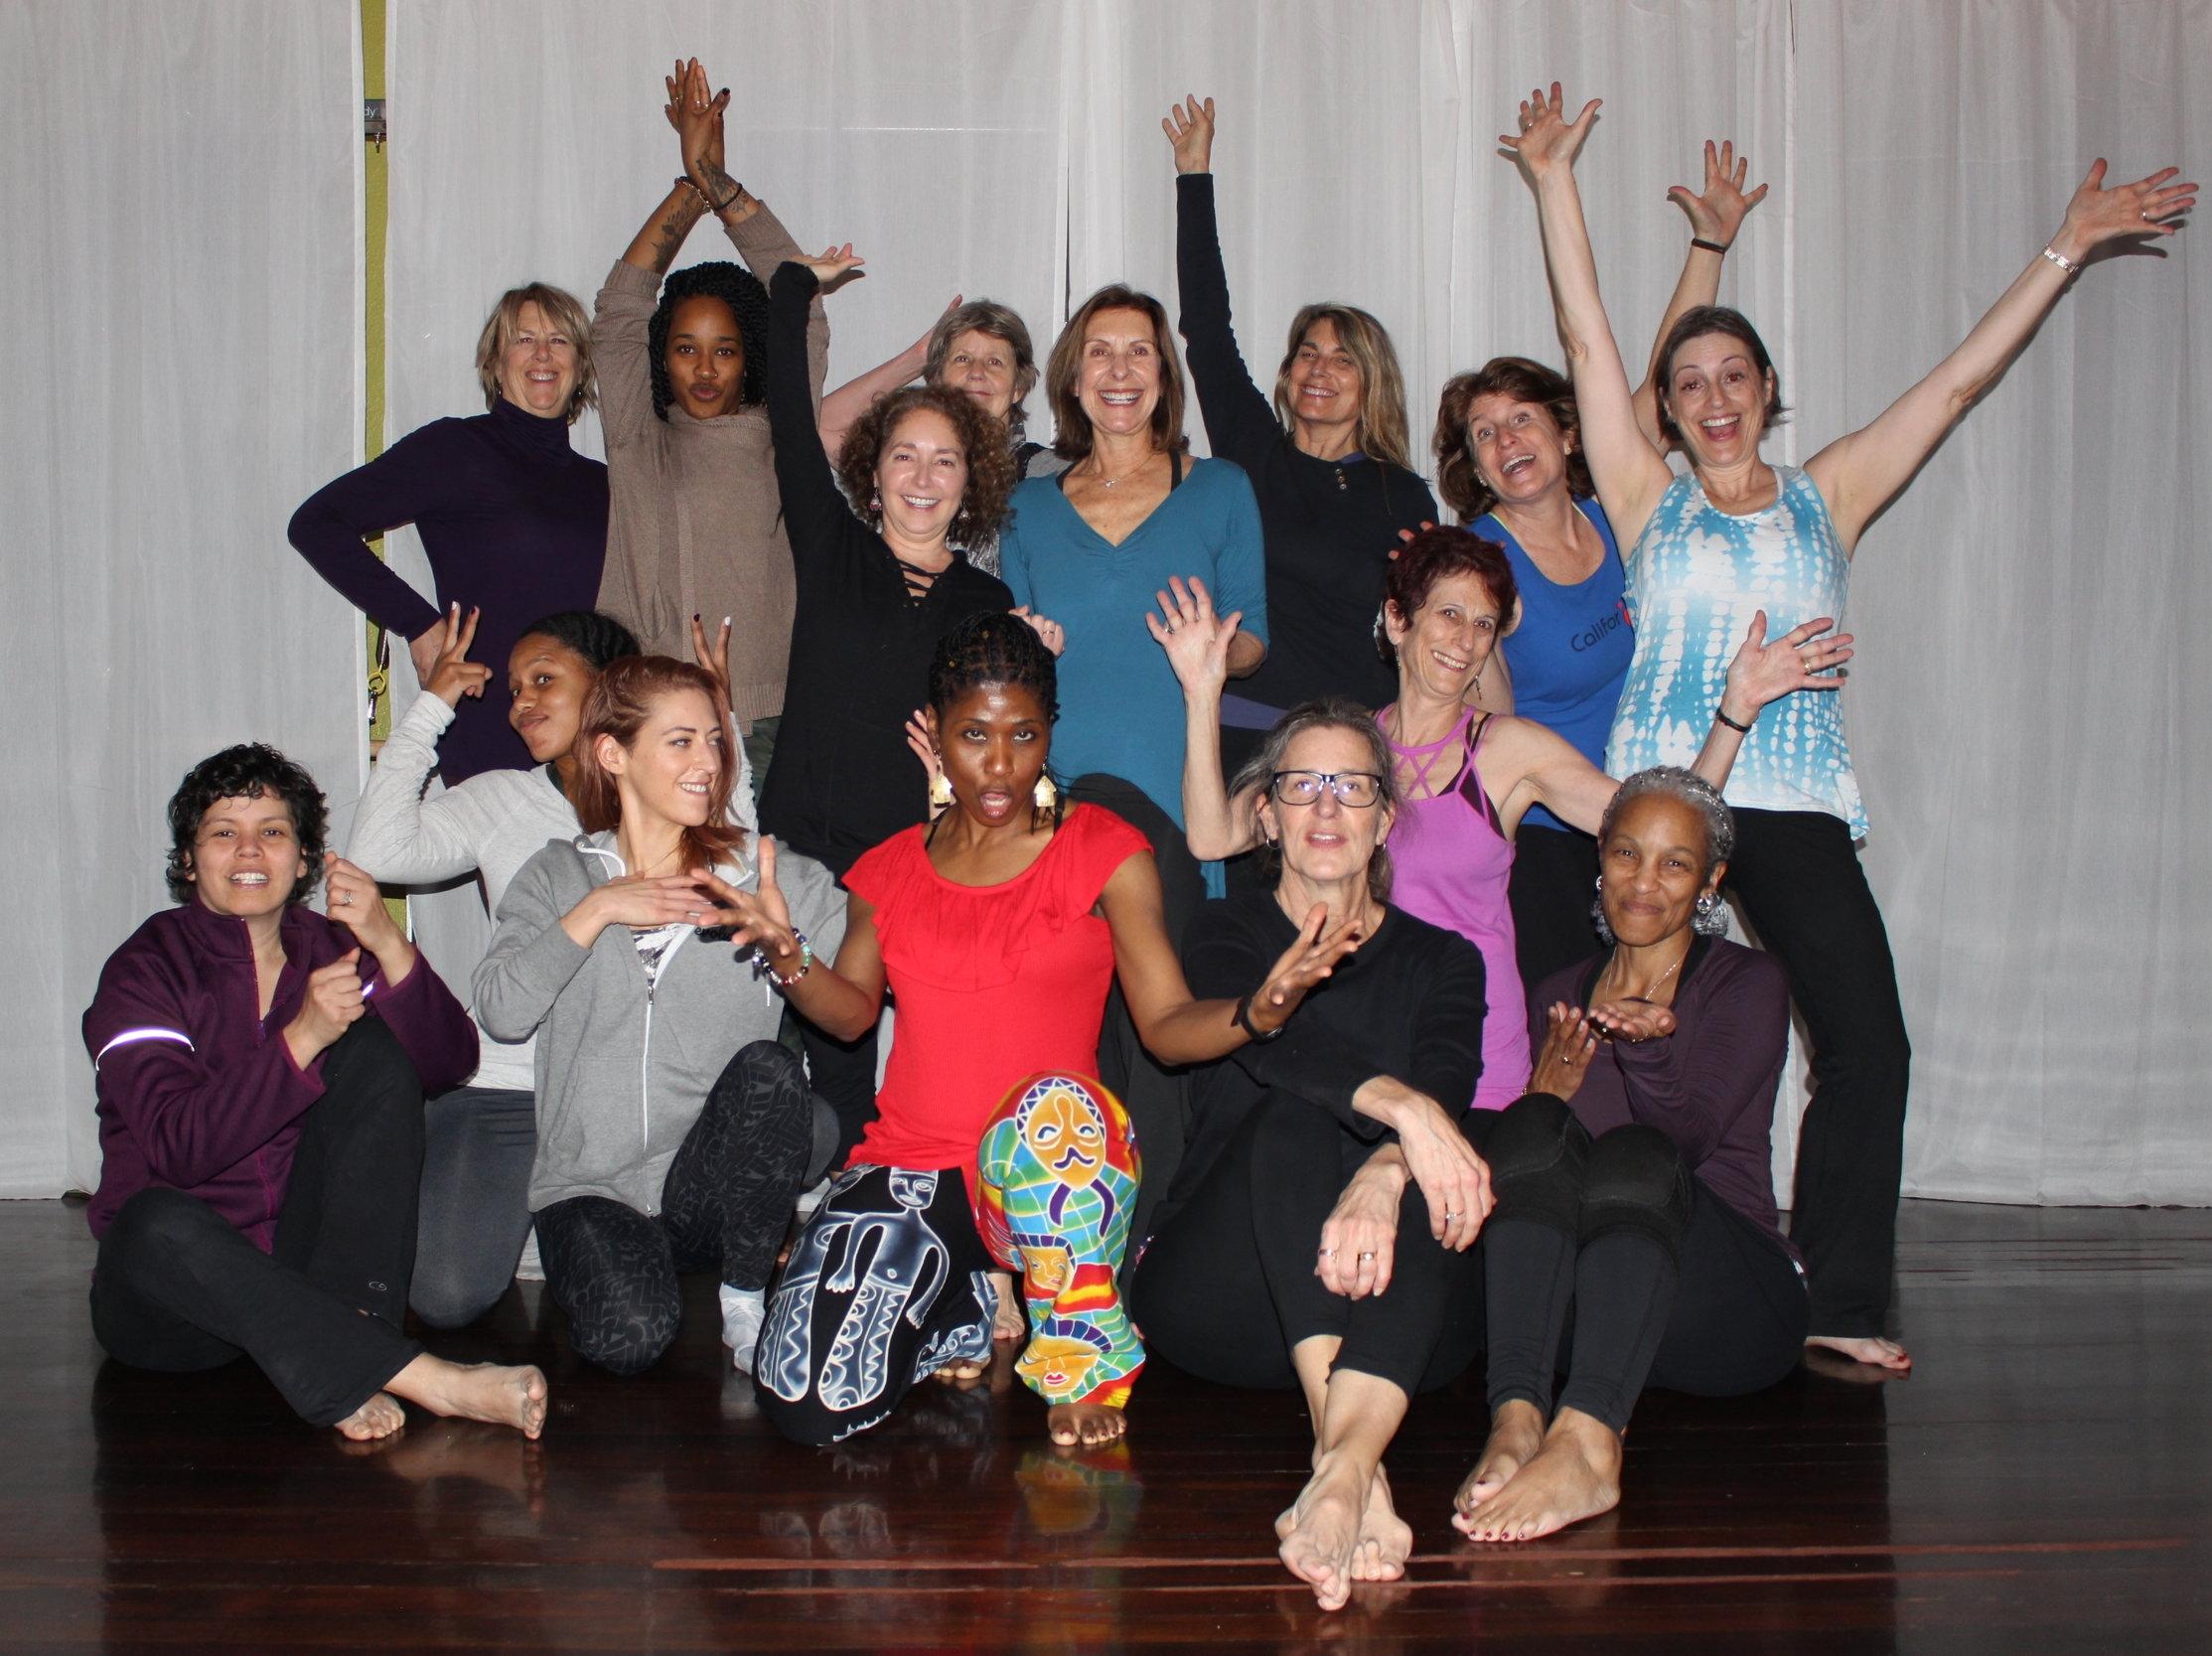 Farcia's Nia Workshop at Body Vibe in San Rafael, CA